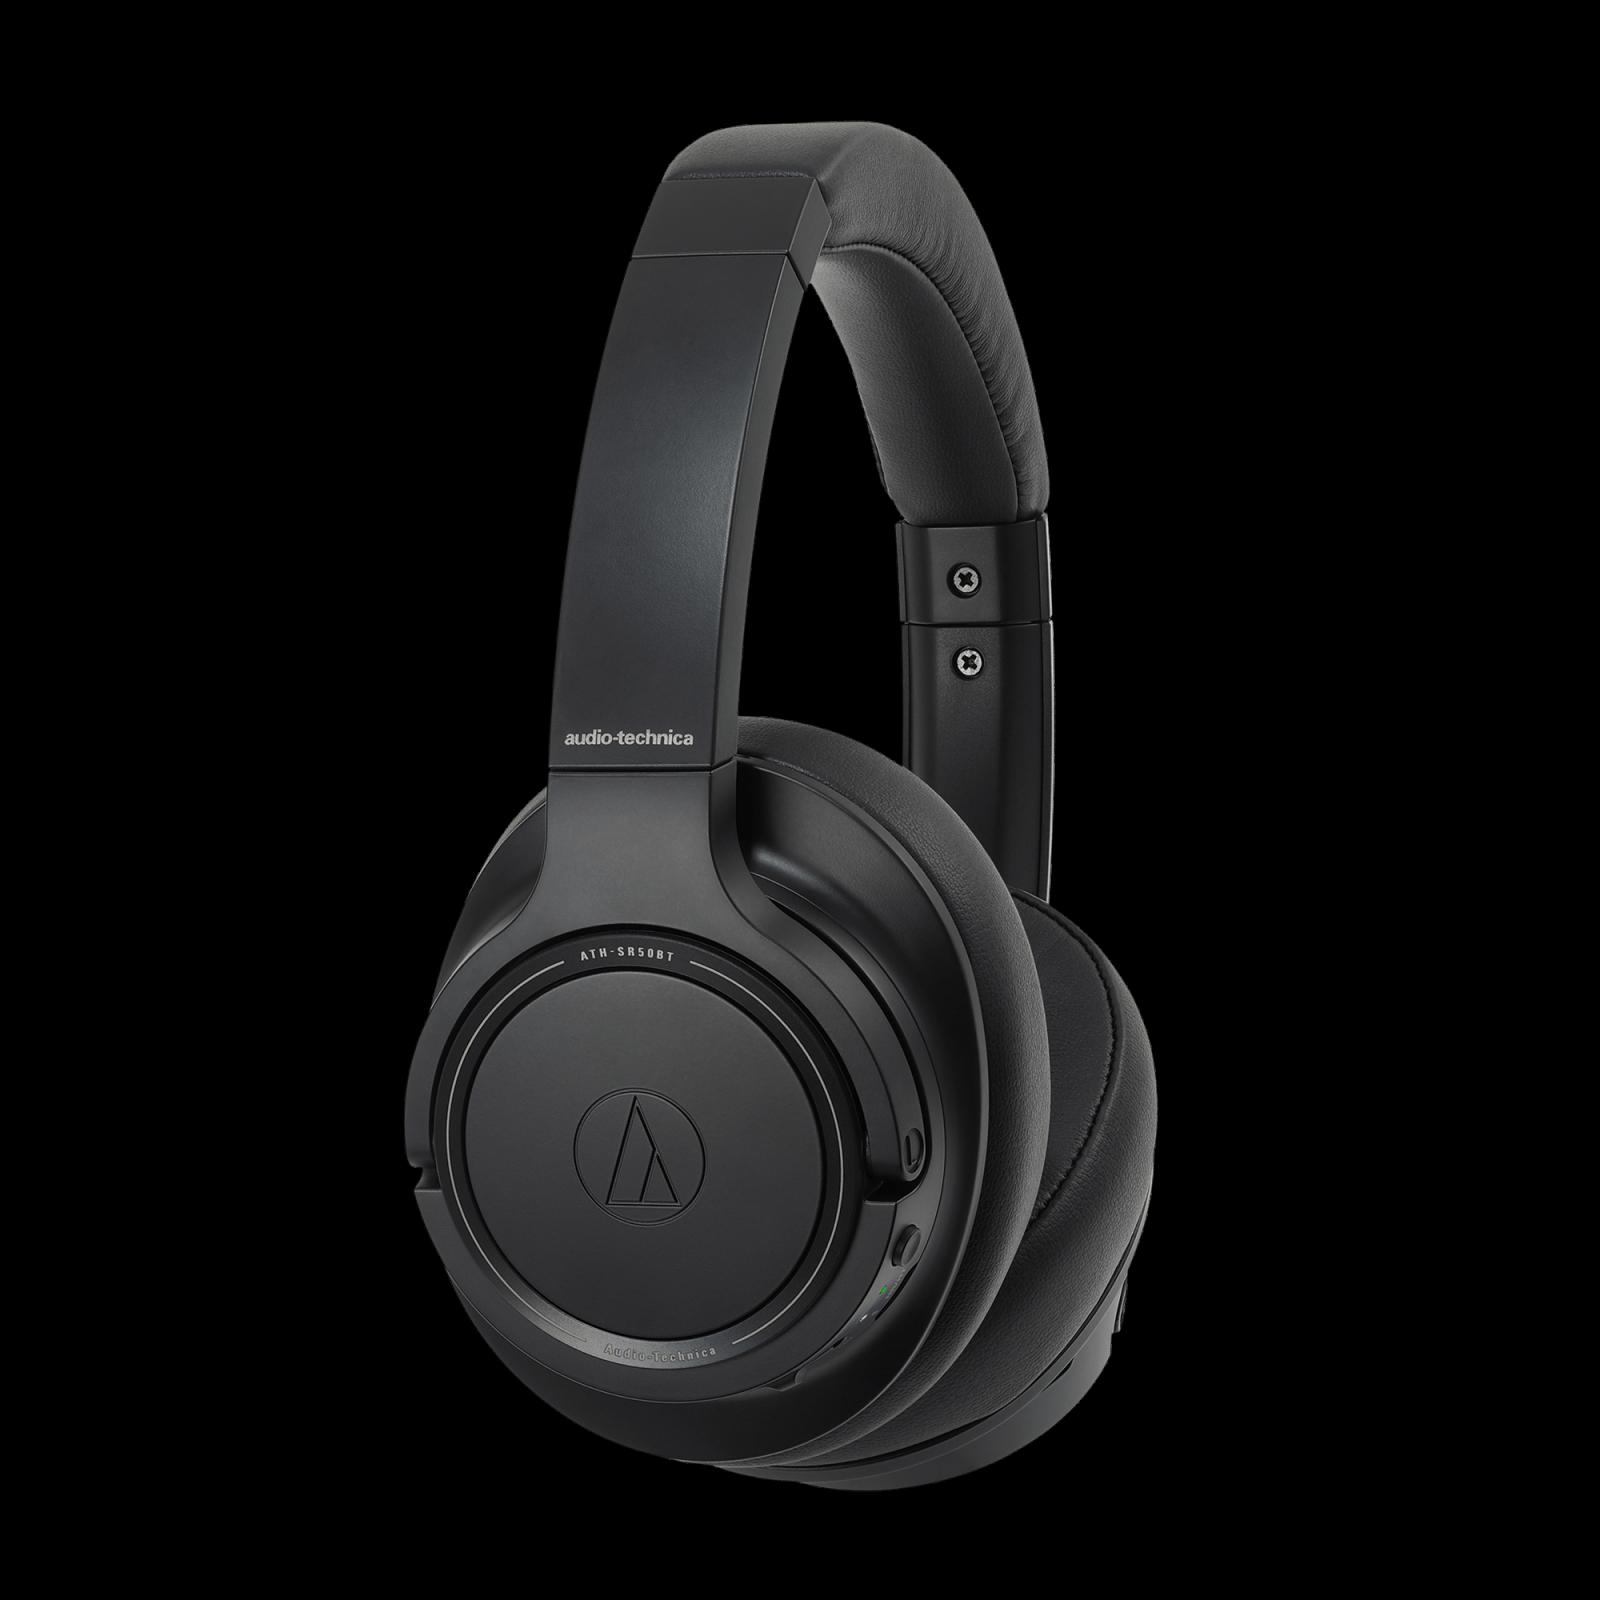 Auido-Technica SR50 Bluetooth Headphones BLACK